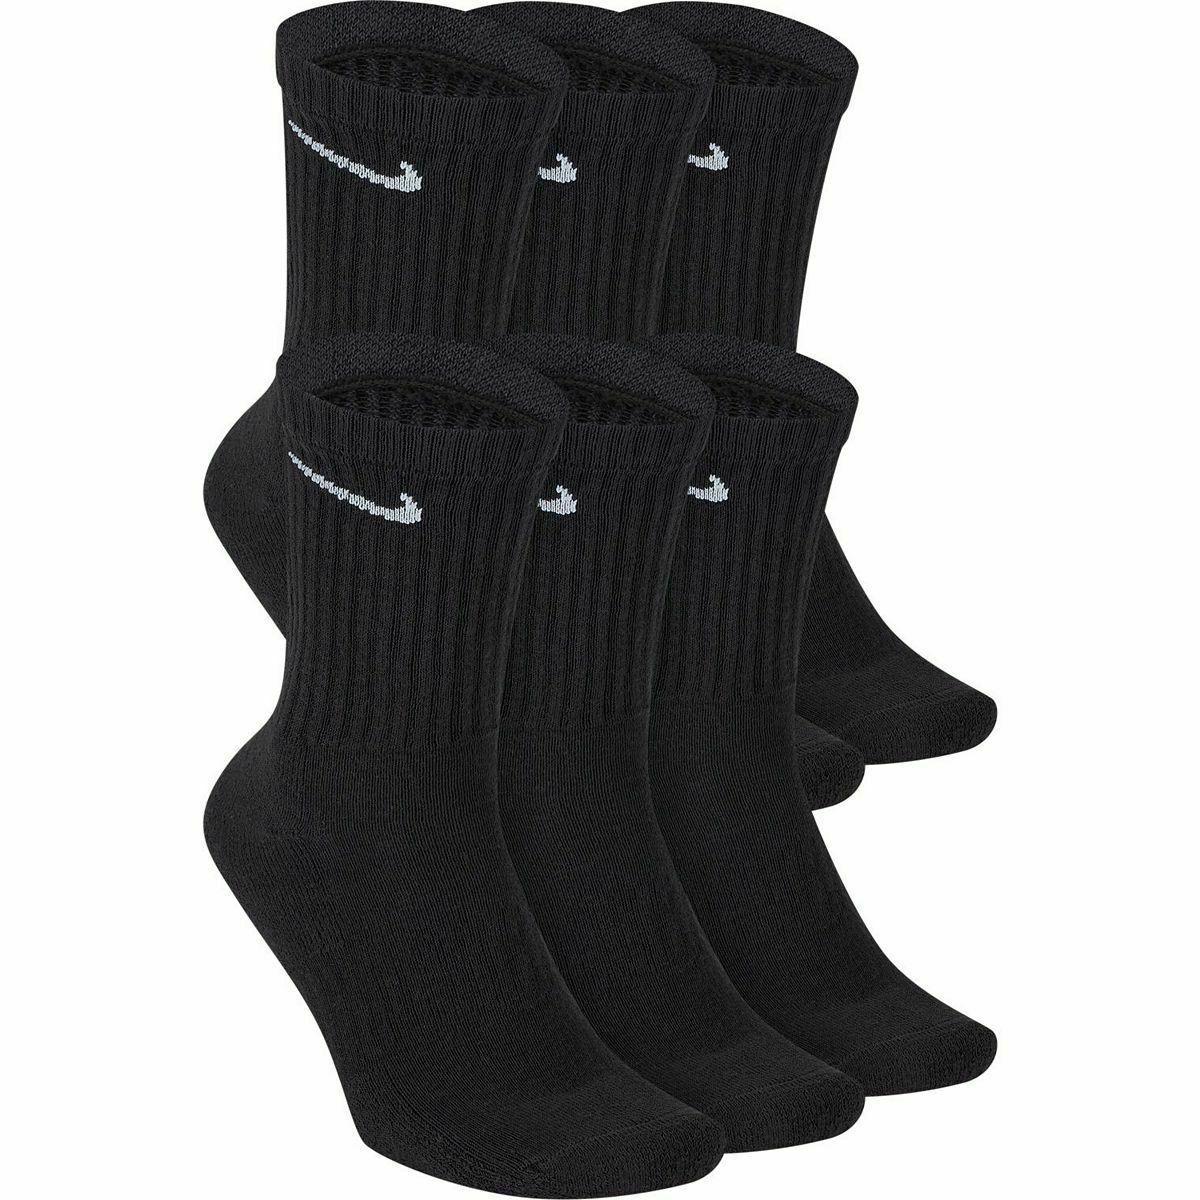 6 pairs everyday cotton cushioned crew socks